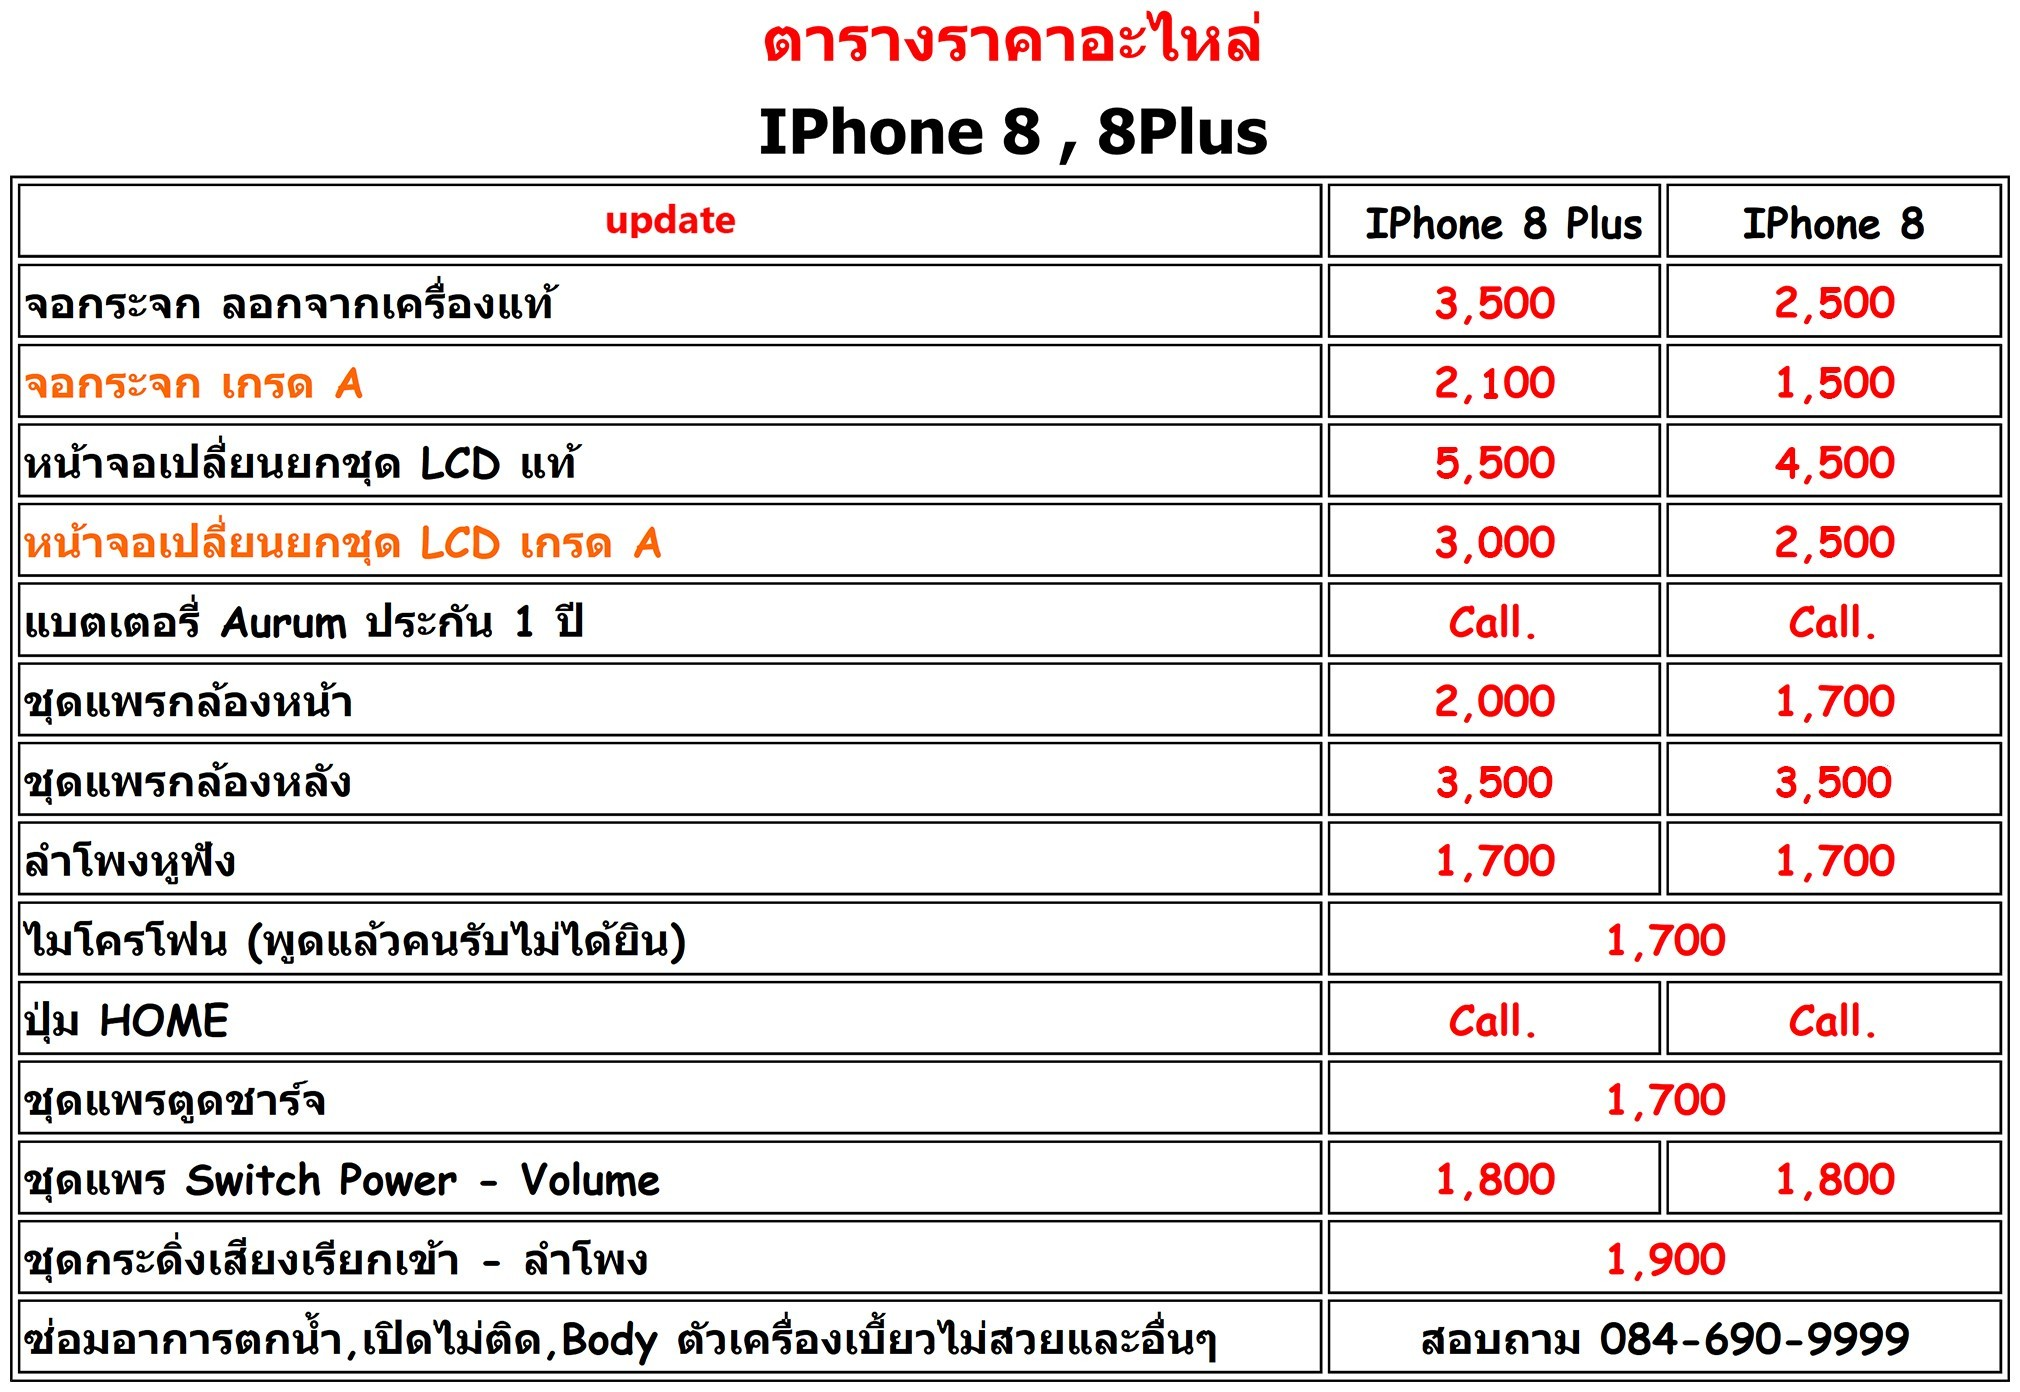 Perfectphonembk.com ซ่อมไอโฟน8 ซ่อมไอโฟน8plus เปลี่ยนจอไอโฟน8 เปลี่ยนจอไอโฟน8plus ซ่อมมือถือ ซ่อมจอมือถือ เปลี่ยนจอ ร้านขายมือถือราคาถูก ซ่อมไอโฟน ราคาซ่อมมือถือ เปลี่ยนจอไอโฟน